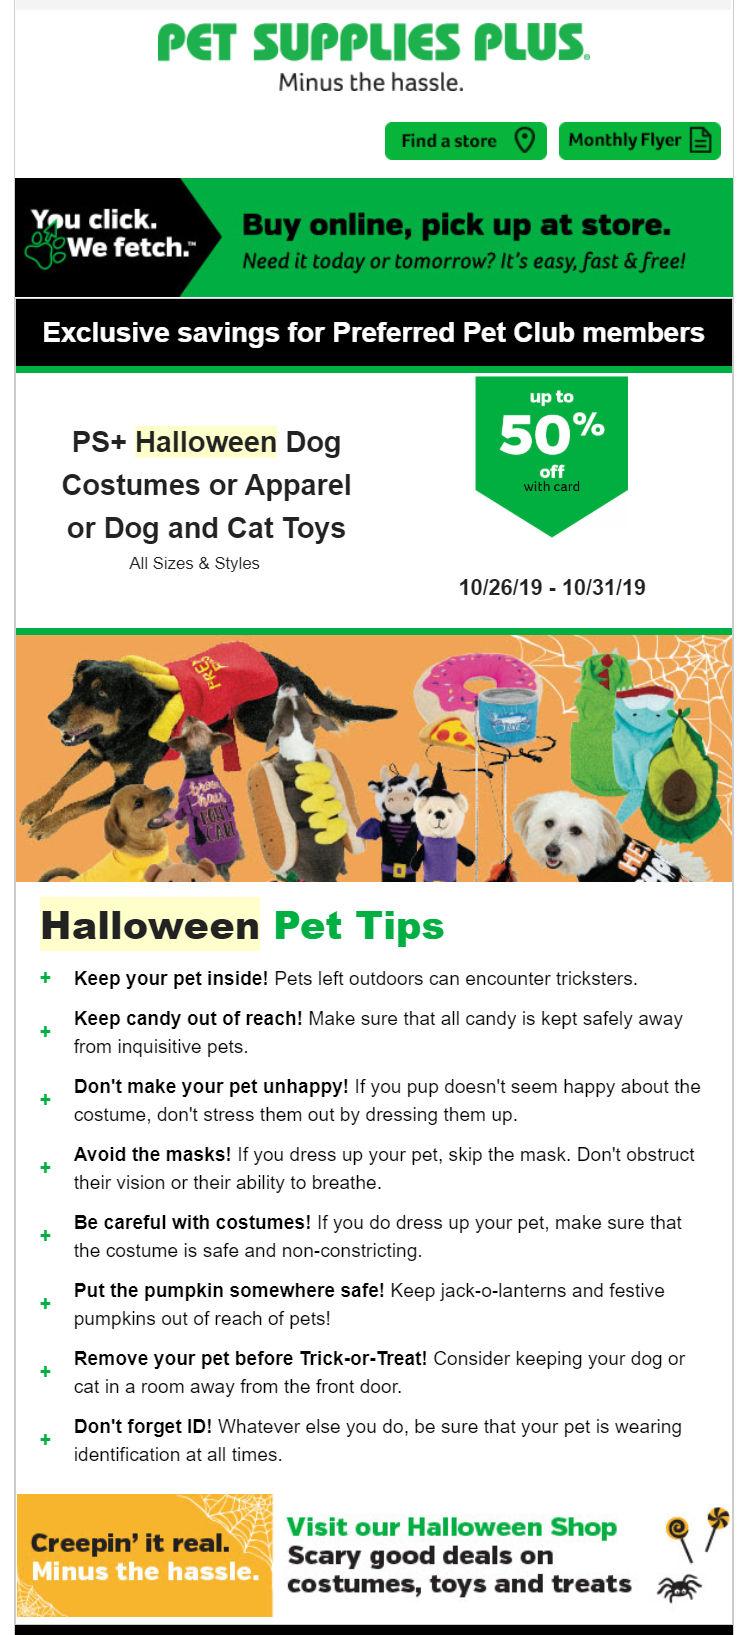 Pet Supplies Plus email campaign